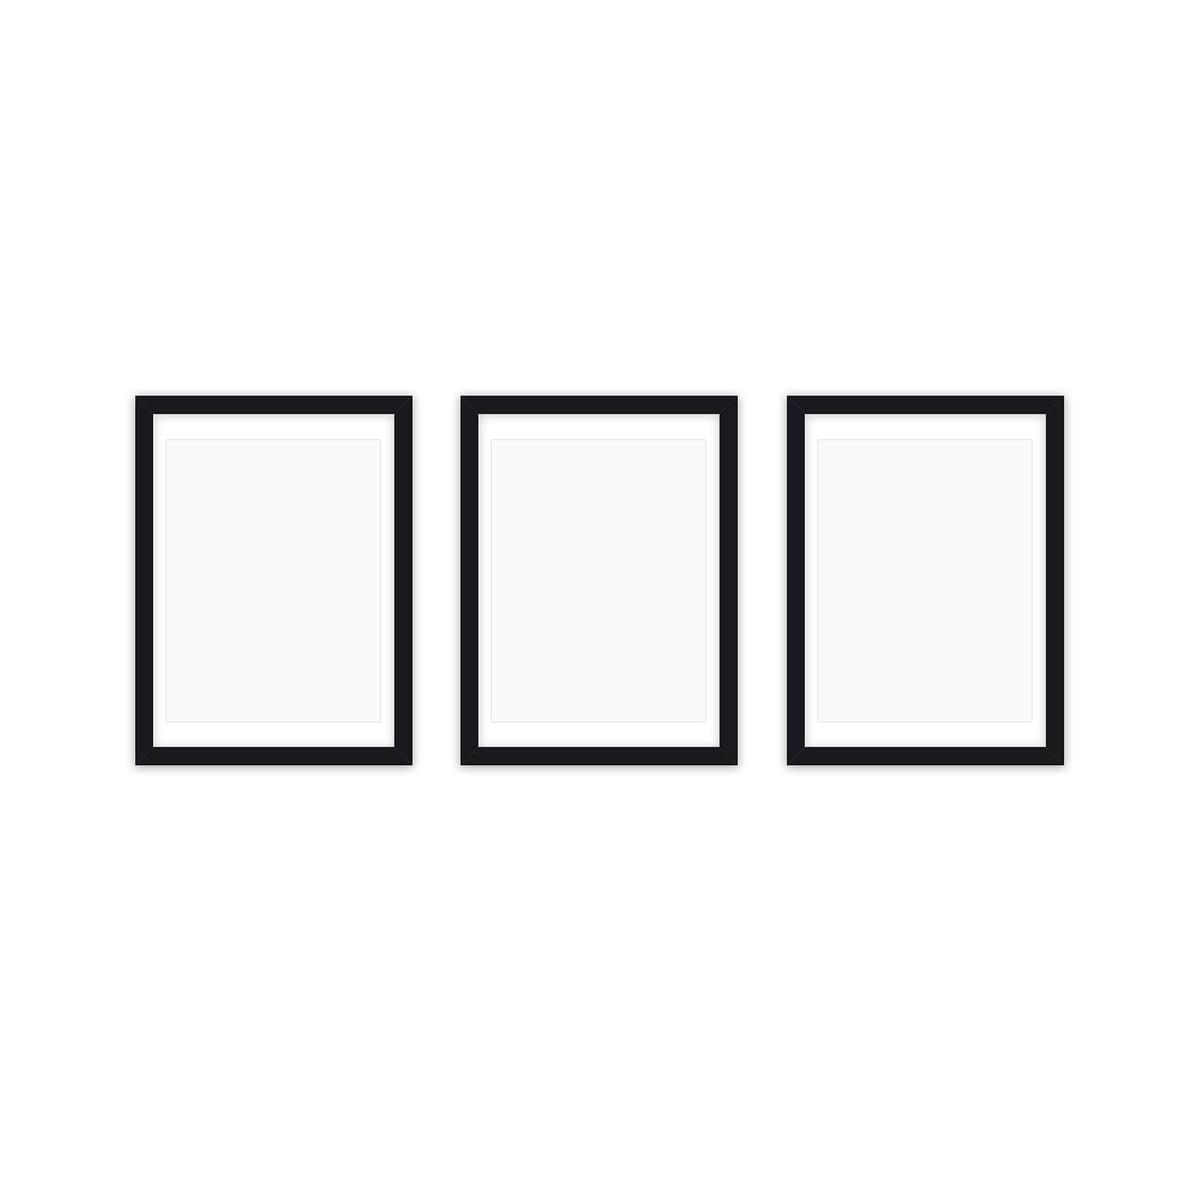 Collection - Frame it Bilderrahmen-Set 3tlg., 21 x 30 cm, schwarz